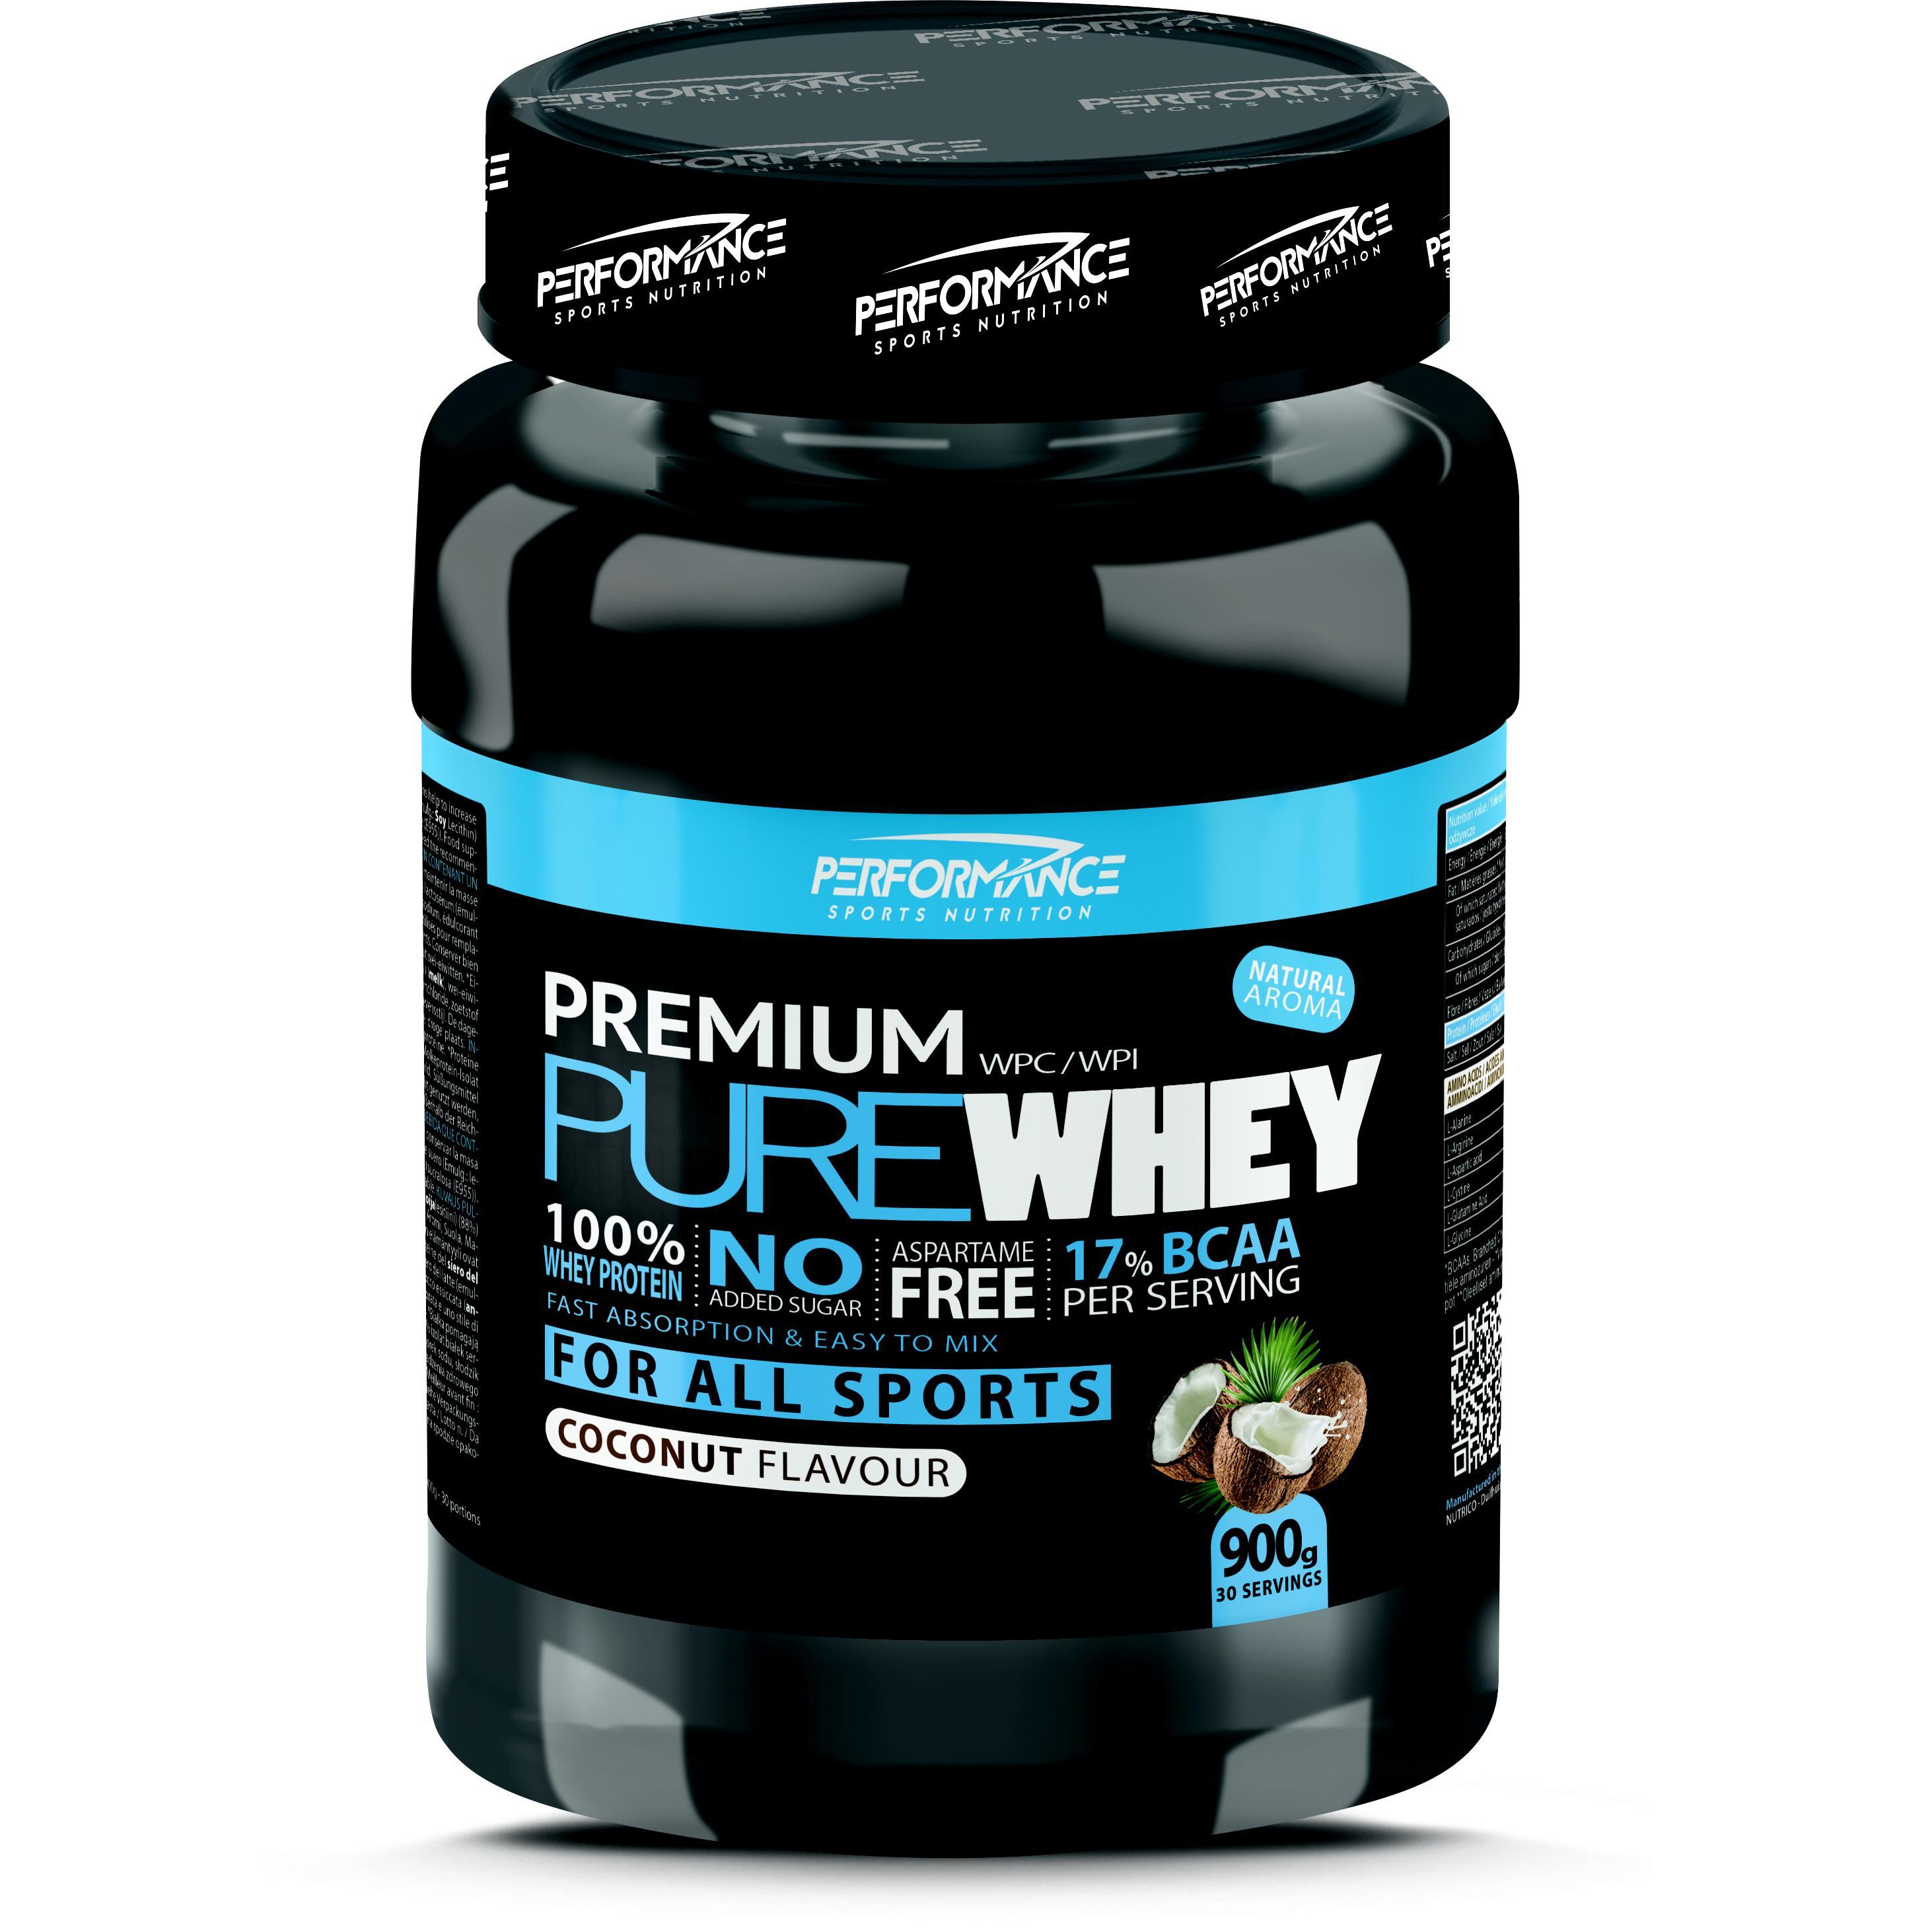 Performance Premium Pure Whey kokosnoot